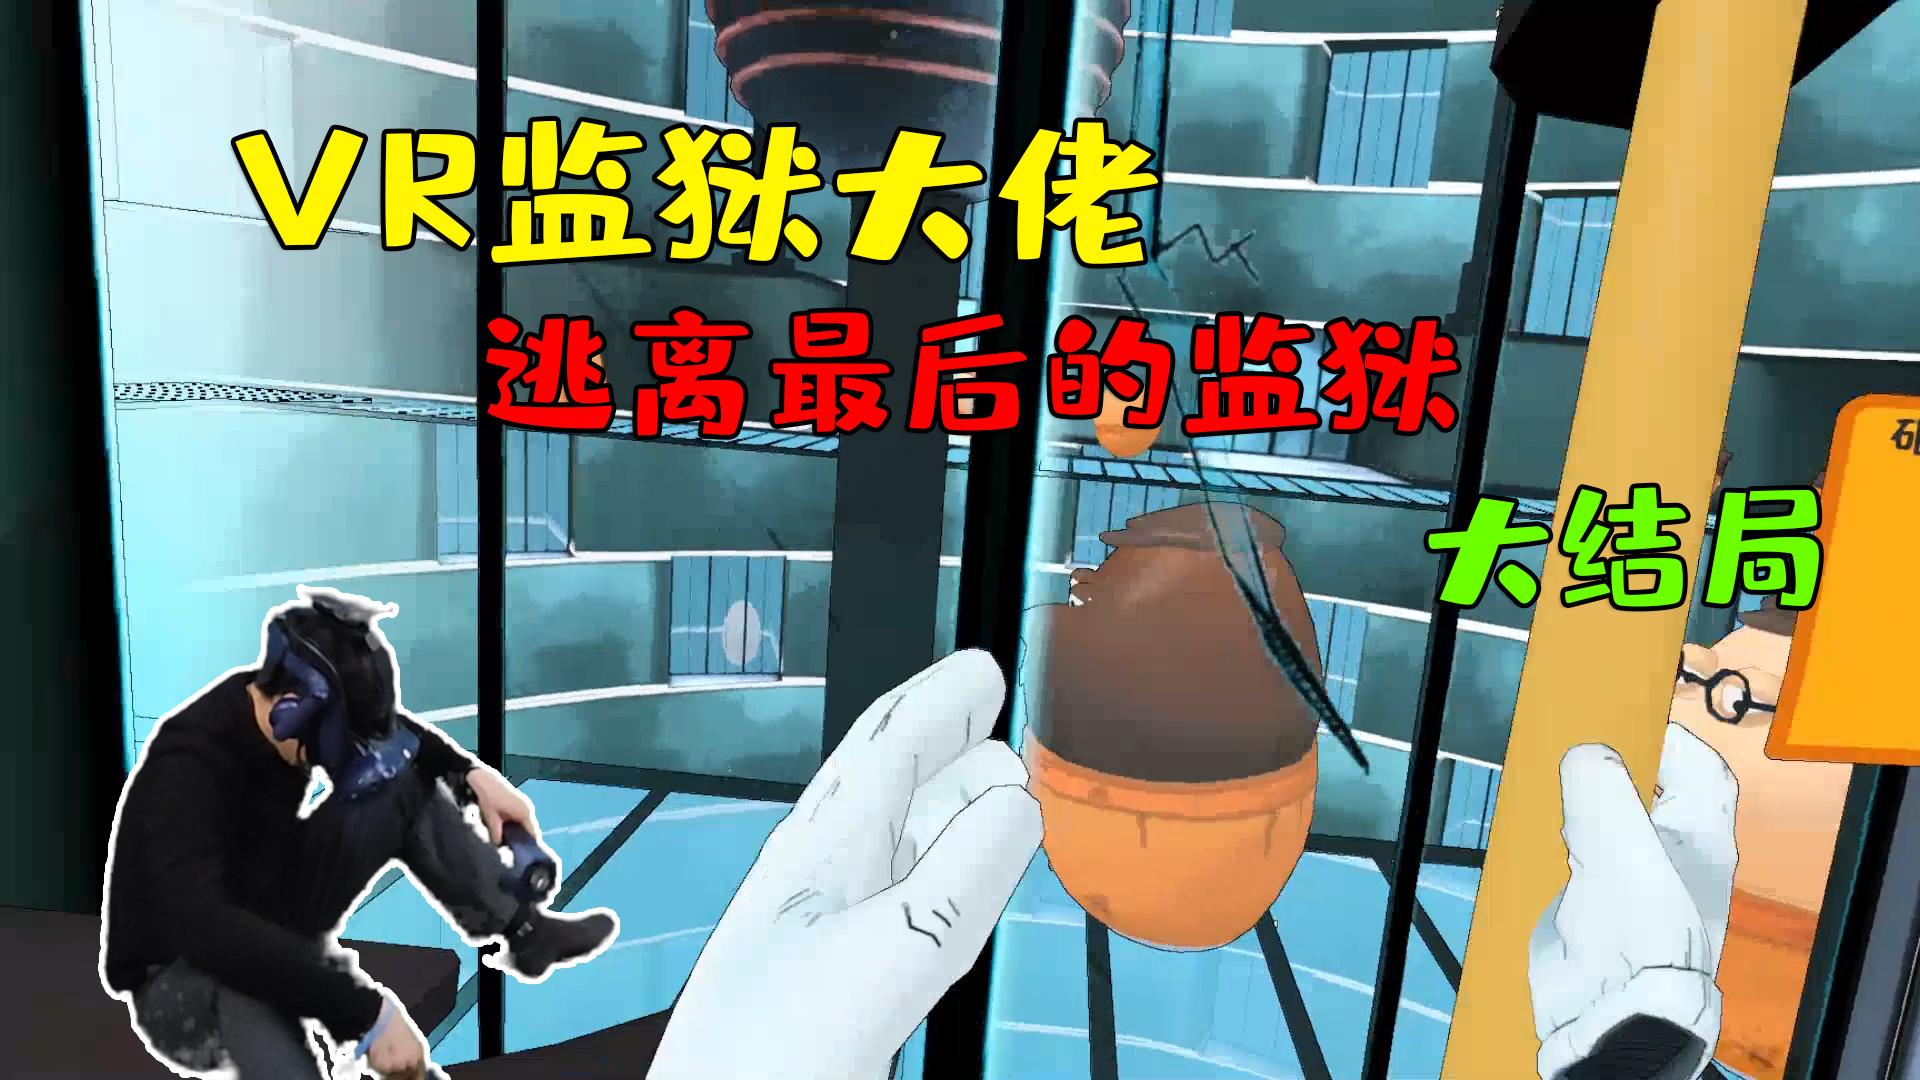 VR监狱大佬:大结局!成功逃离终极水晶监狱!